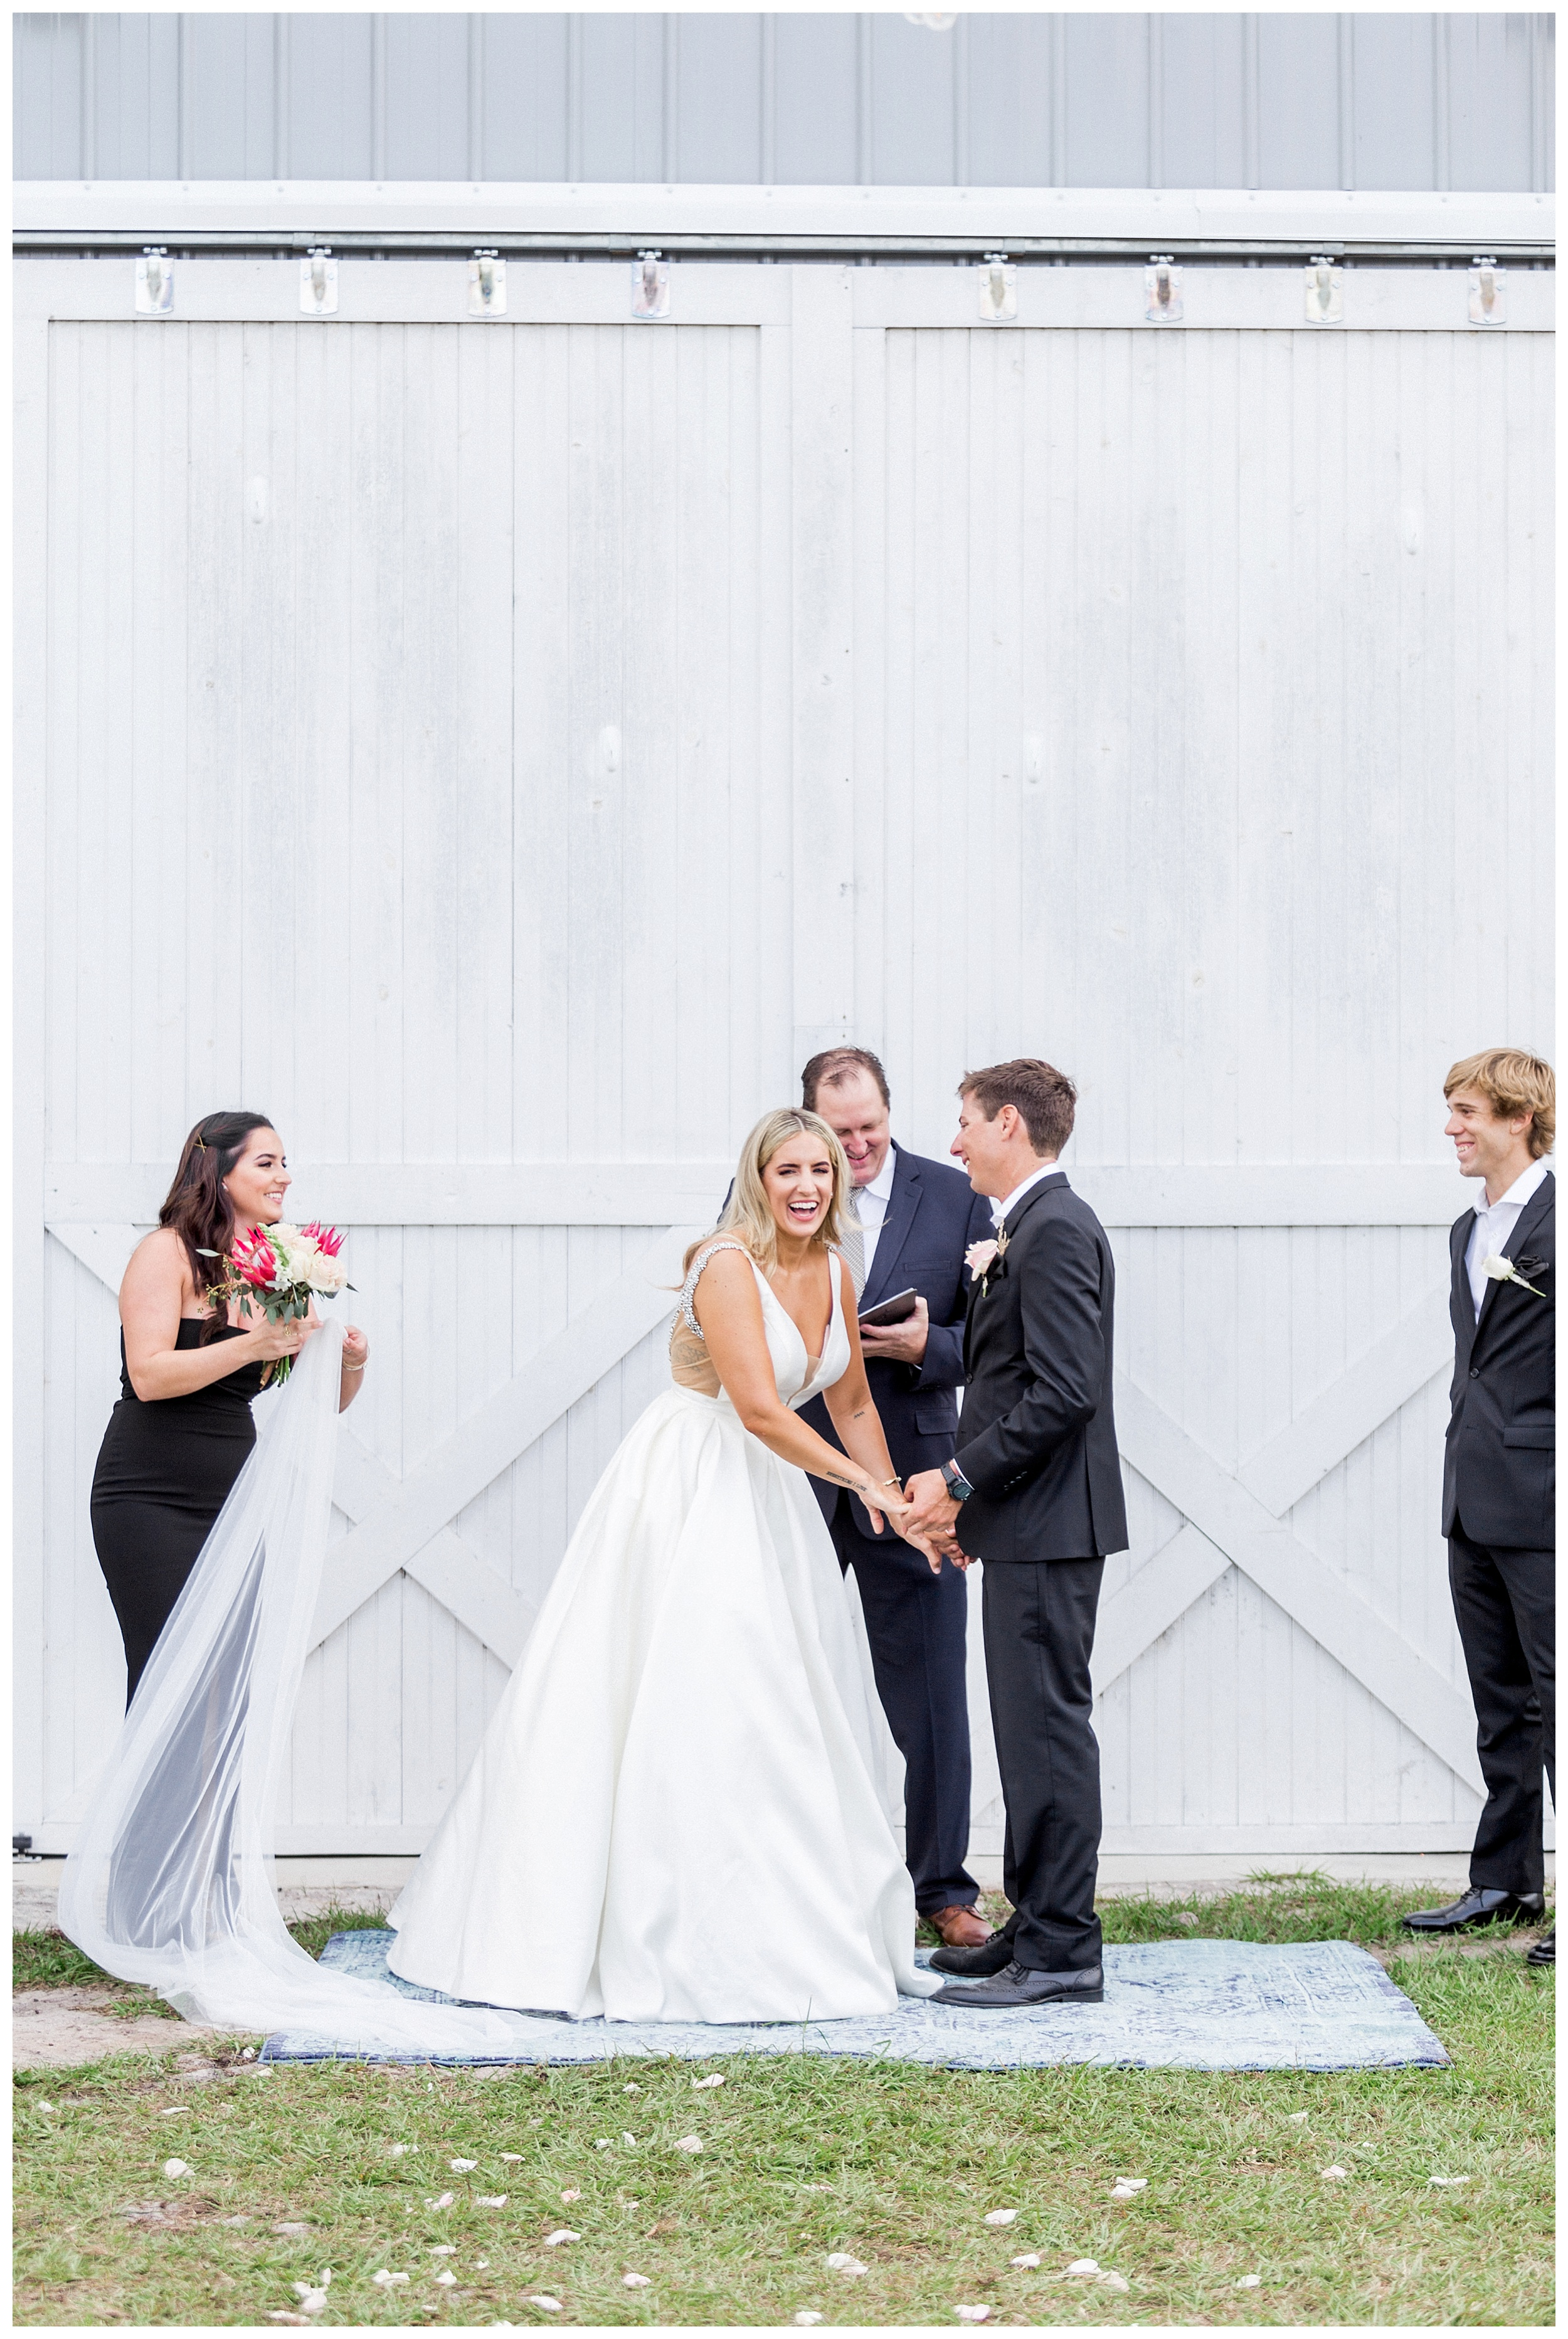 South Florida Wedding Photographer Kir Tuben_0079.jpg